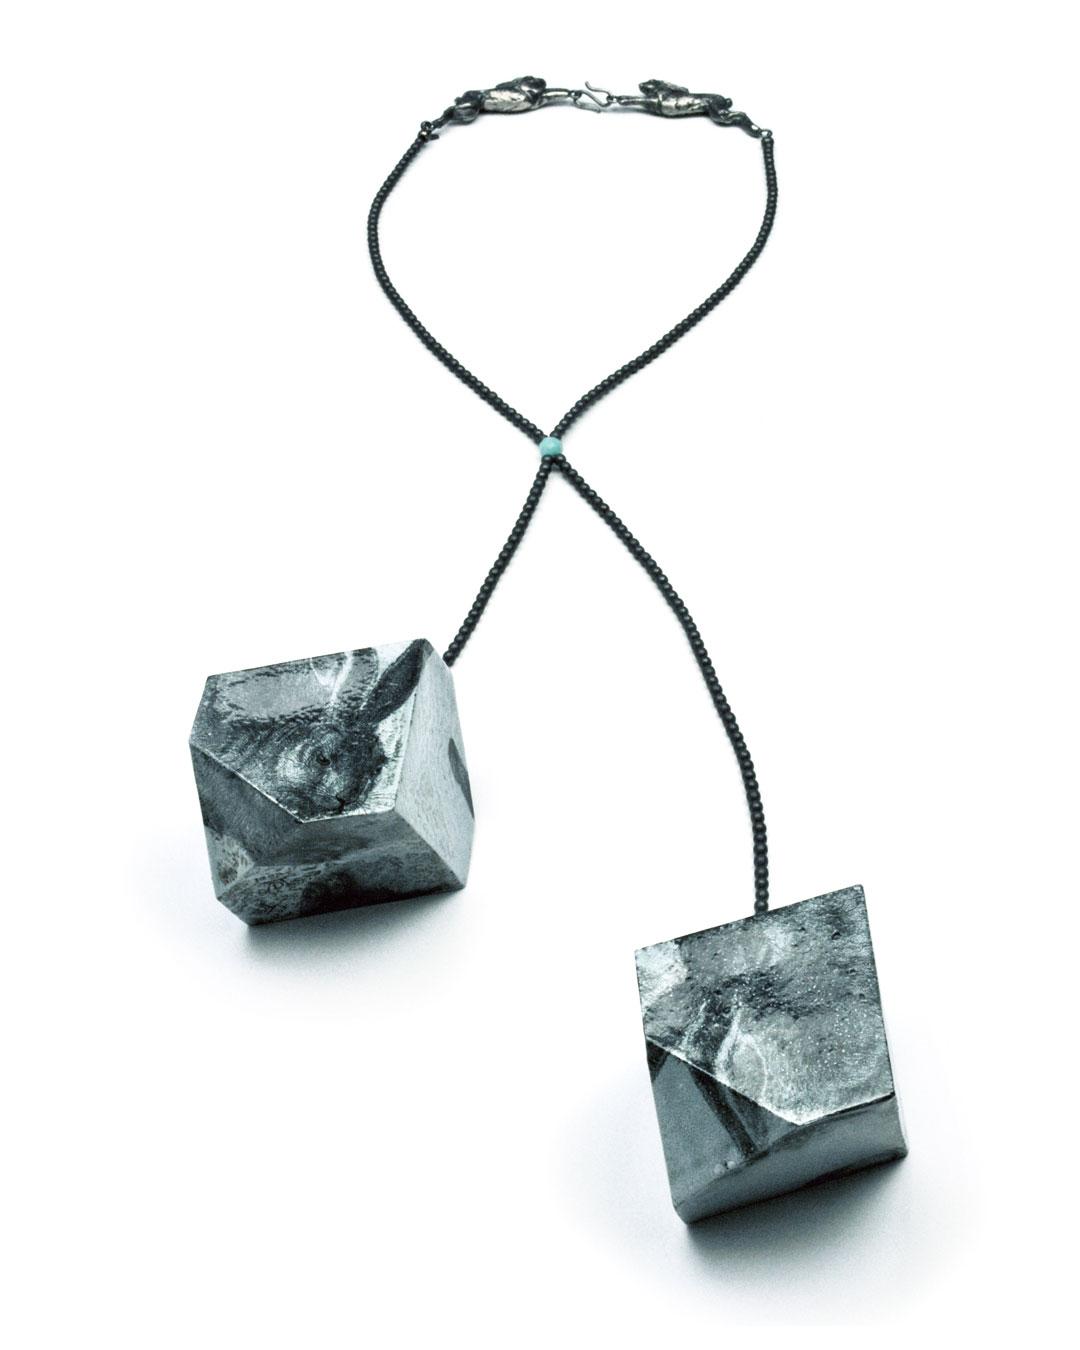 Vera Siemund, untitled, 2015, necklace; enamelled copper, hematine, silver, enamelled printed images, 60 x 45 x 55 mm, €2150